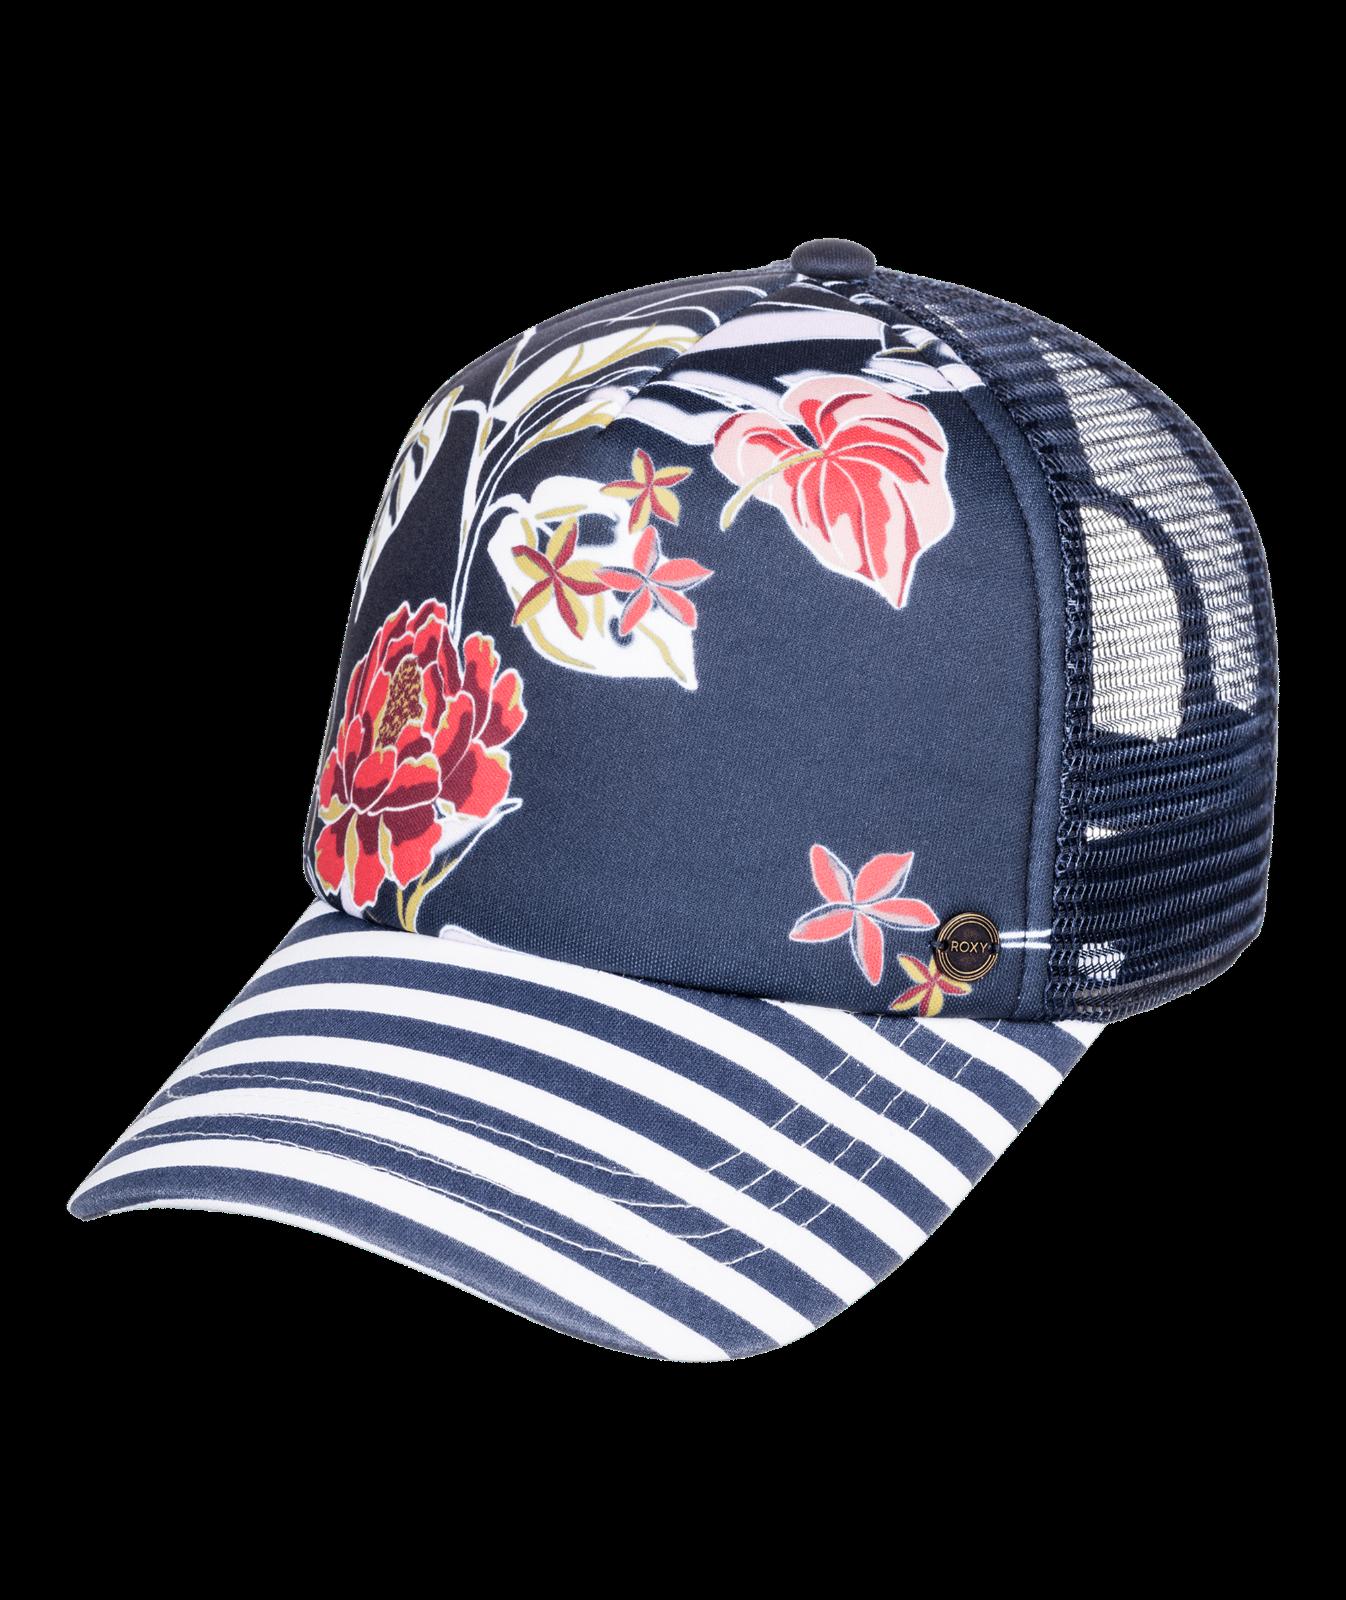 Roxy Mujer Gorra de Béisbol. nuevo Hermoso mañana a Rayas Azul Marino Snap Camionero Sombrero W21